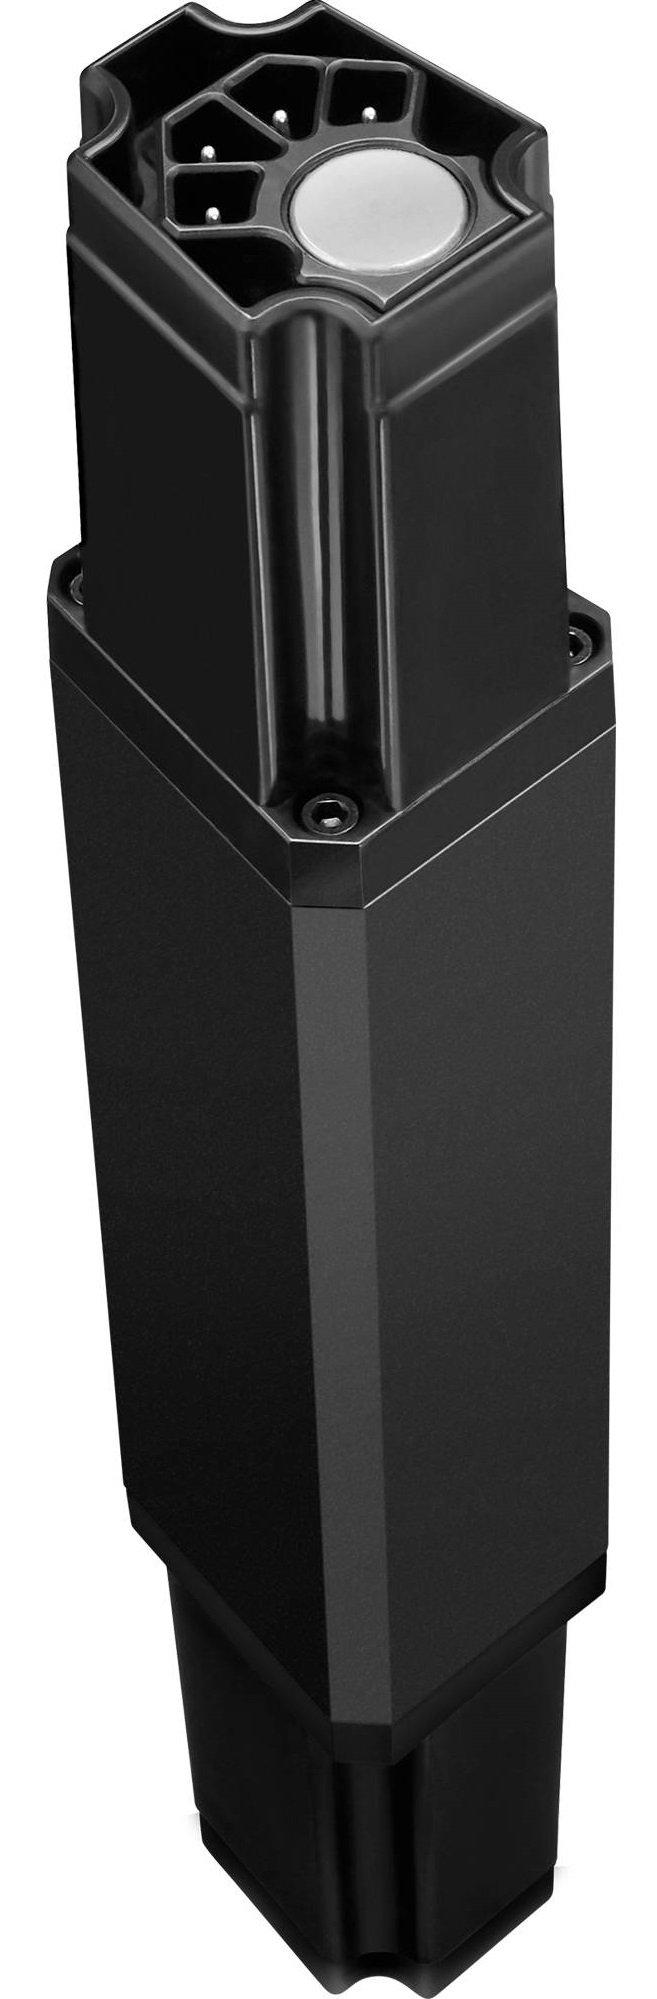 electro-voice-short-column-speaker-pole-for-the-evolve50.jpeg